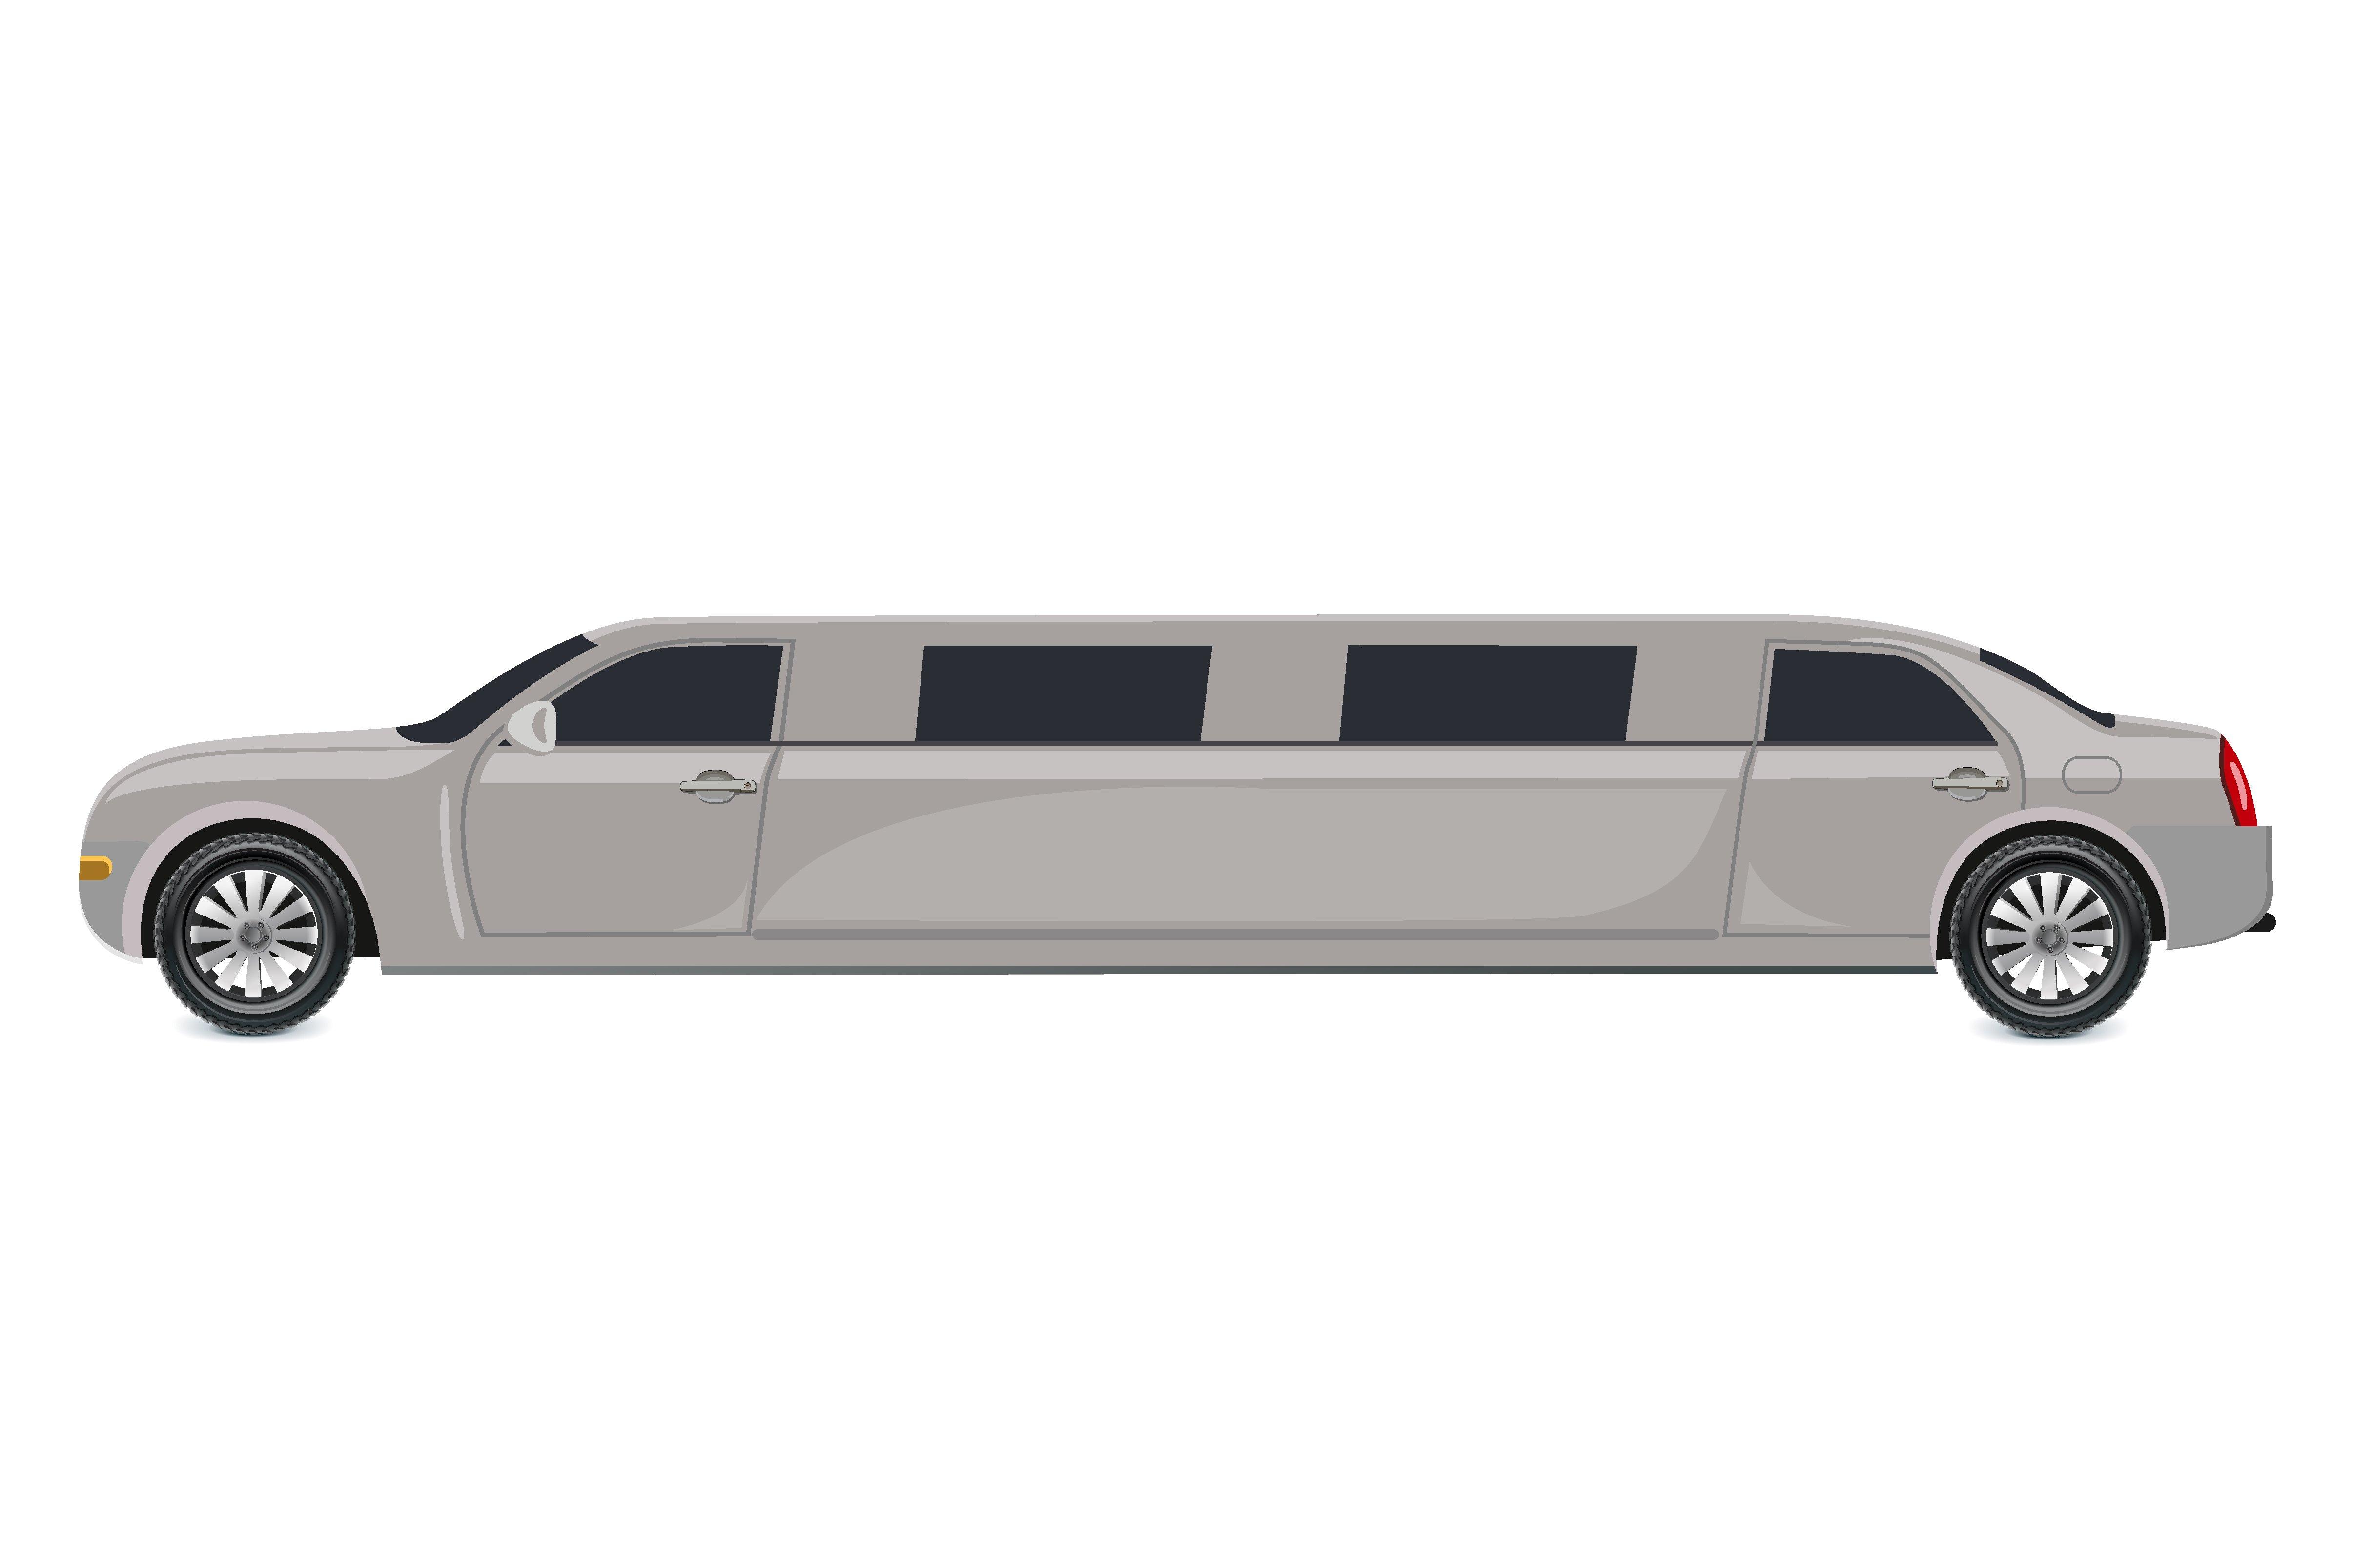 White Limousine Vector Illustration Illustrations